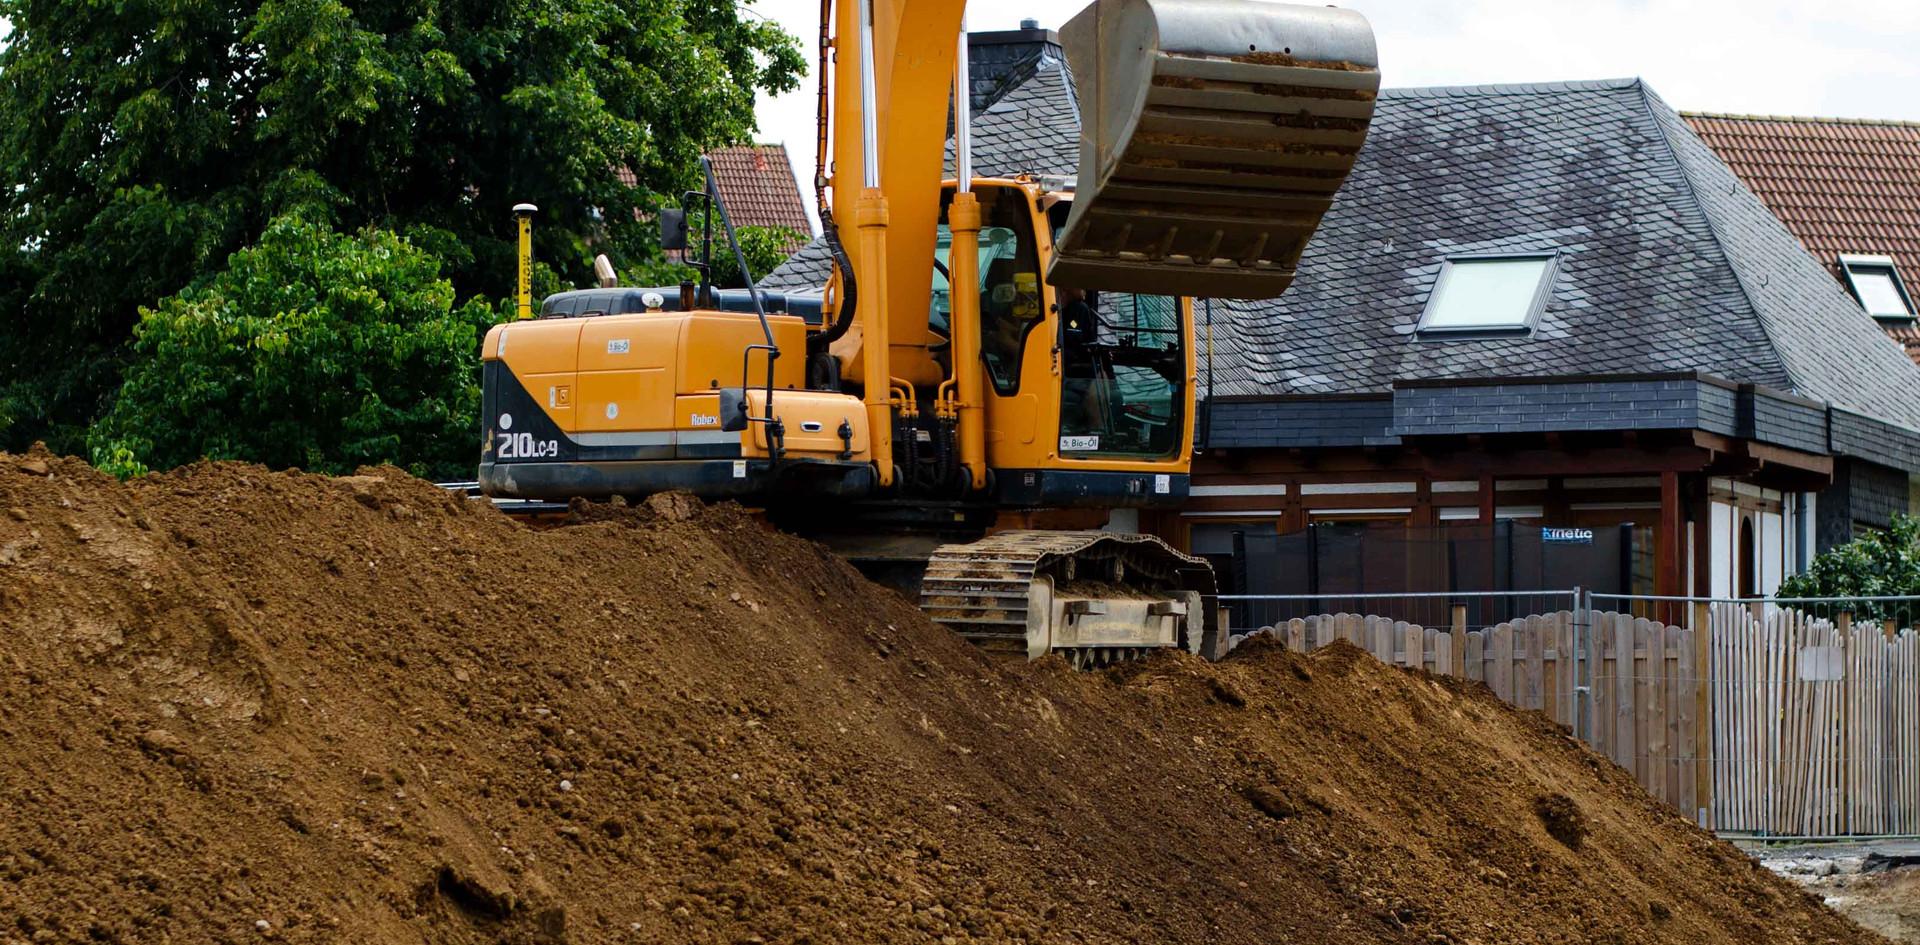 DSC_0391190702 Glasmacher BV Rheinbach.j